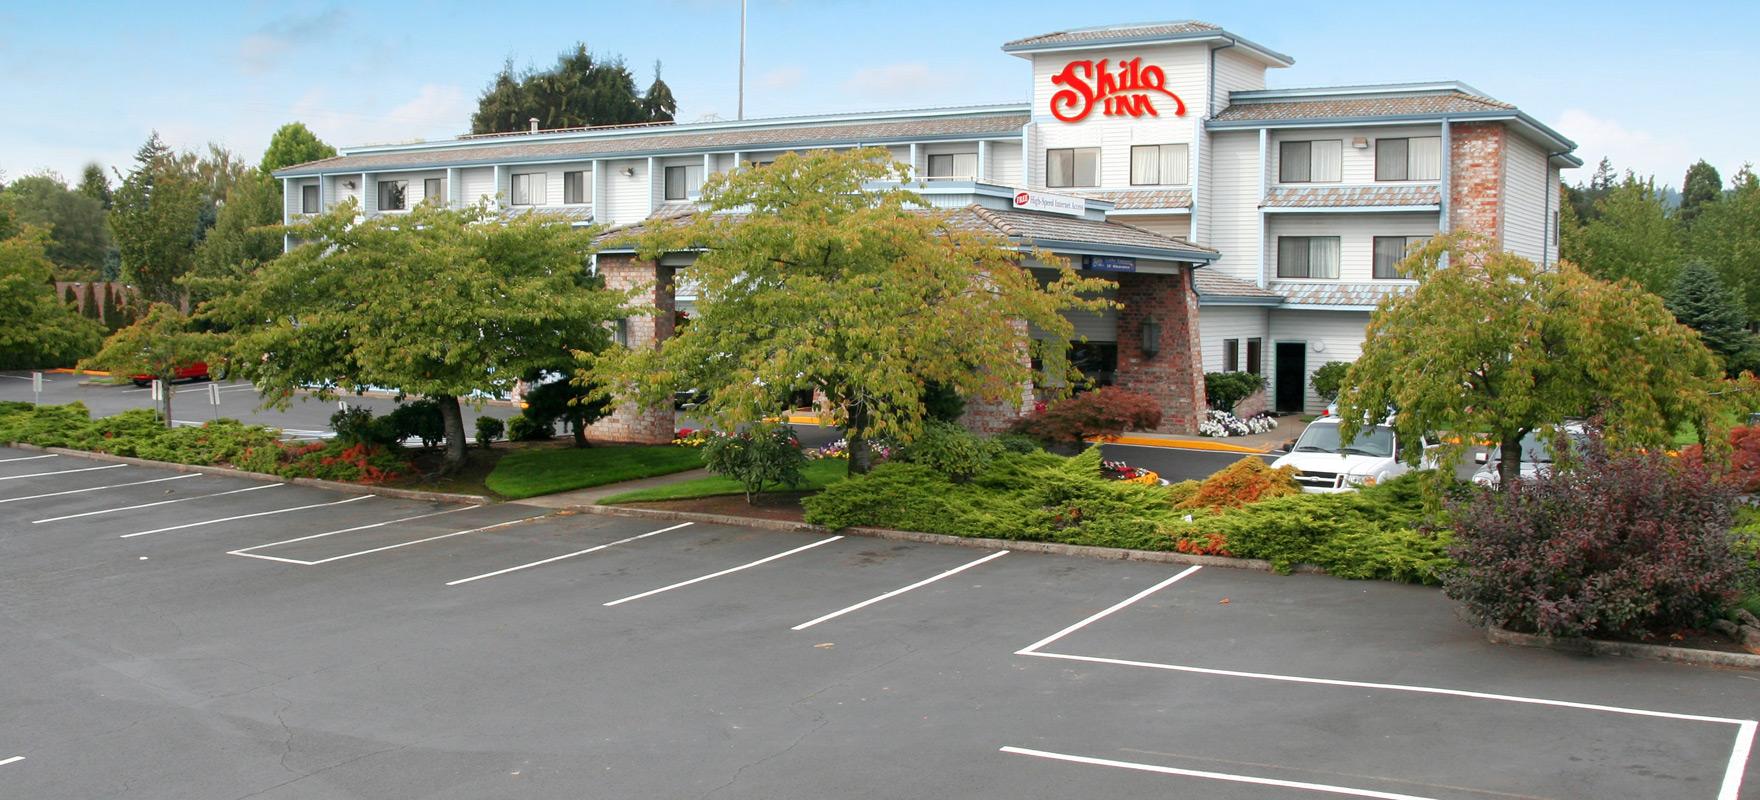 Shilo Inns Suites Hotels Newberg Oregon